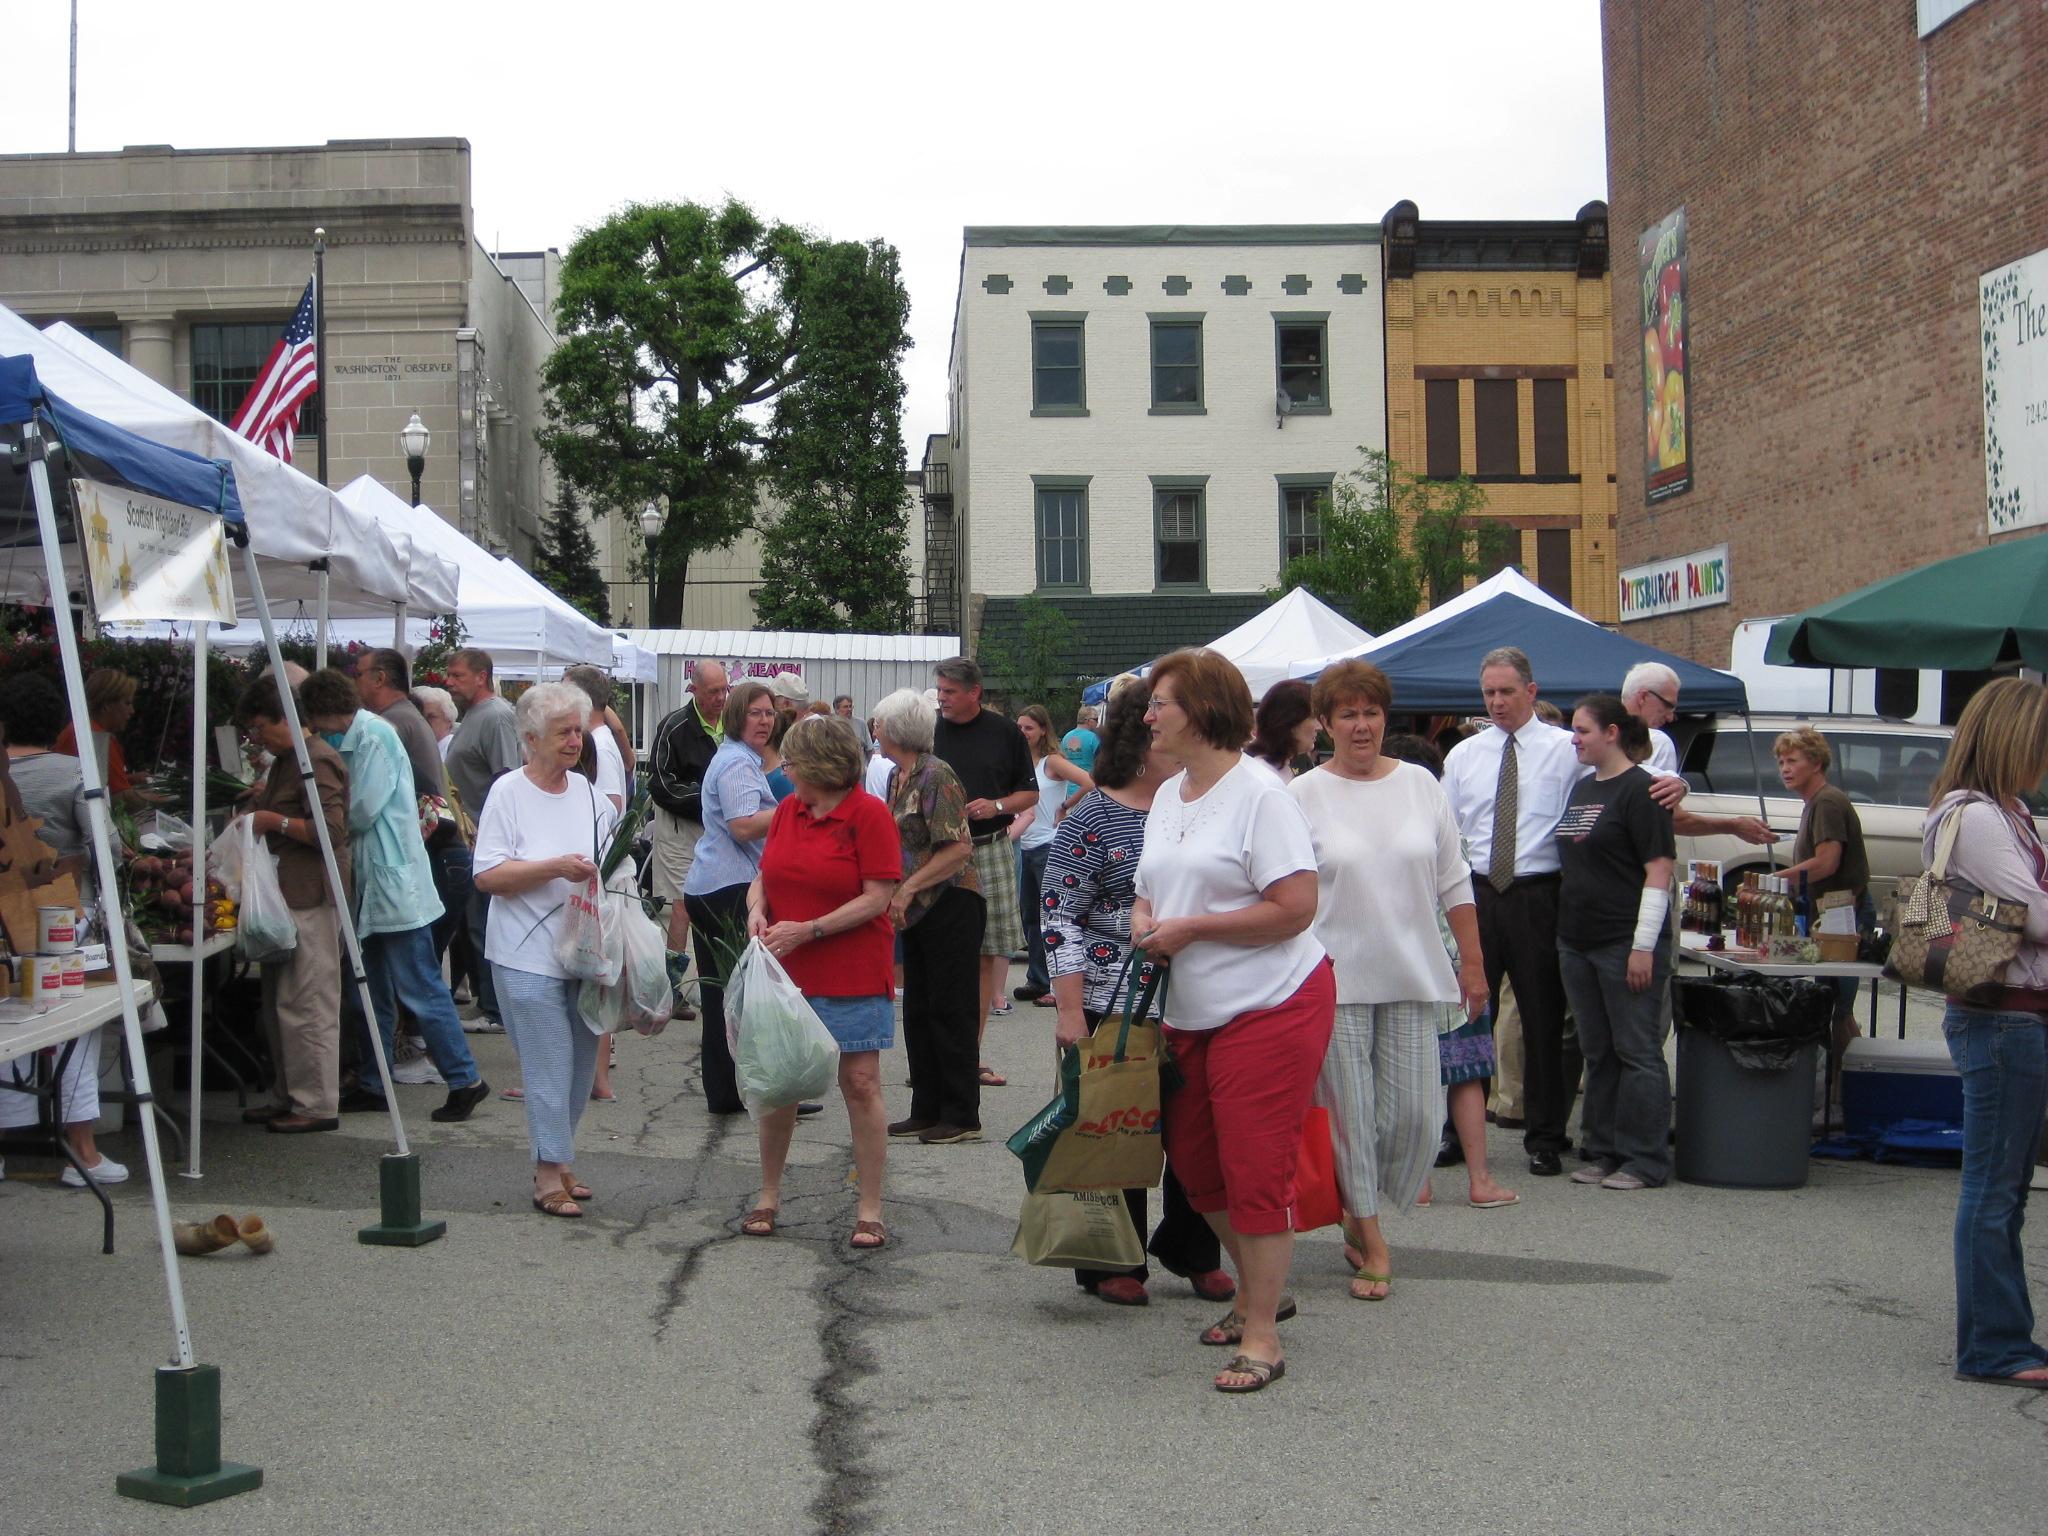 The Main Street Farmers Market